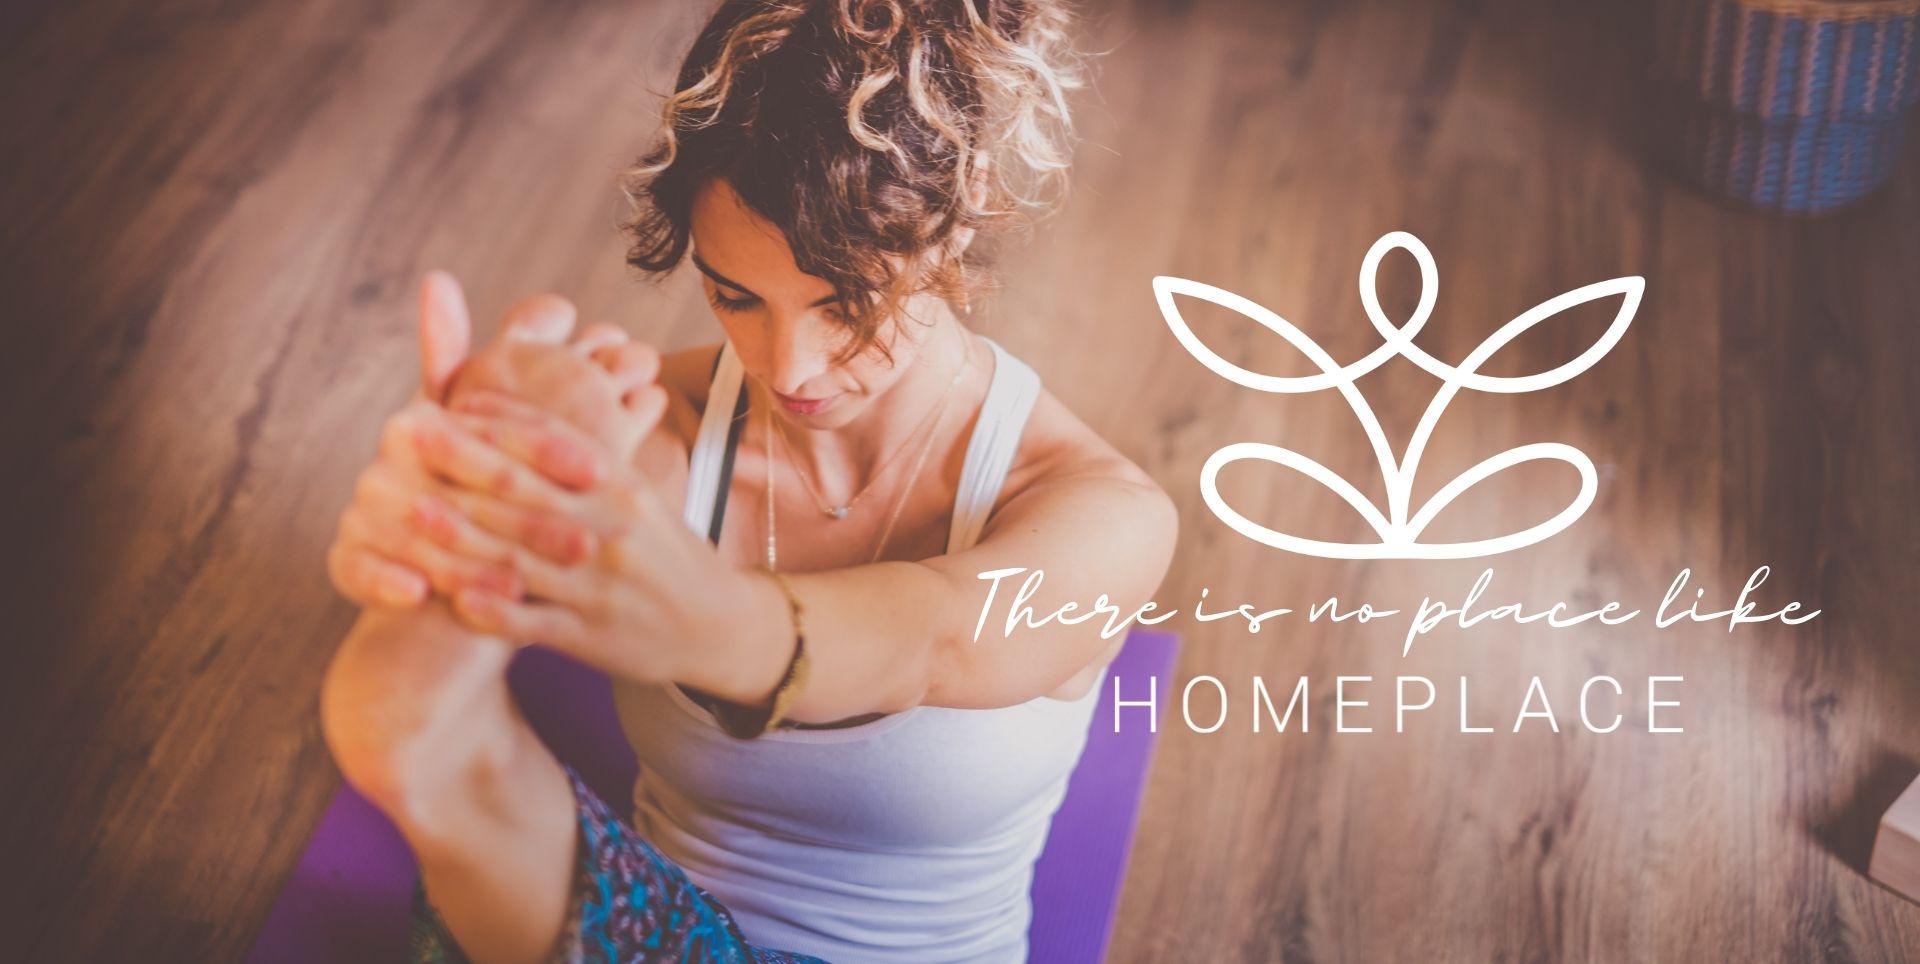 Homeplace - prostor za razvoj tela i duha